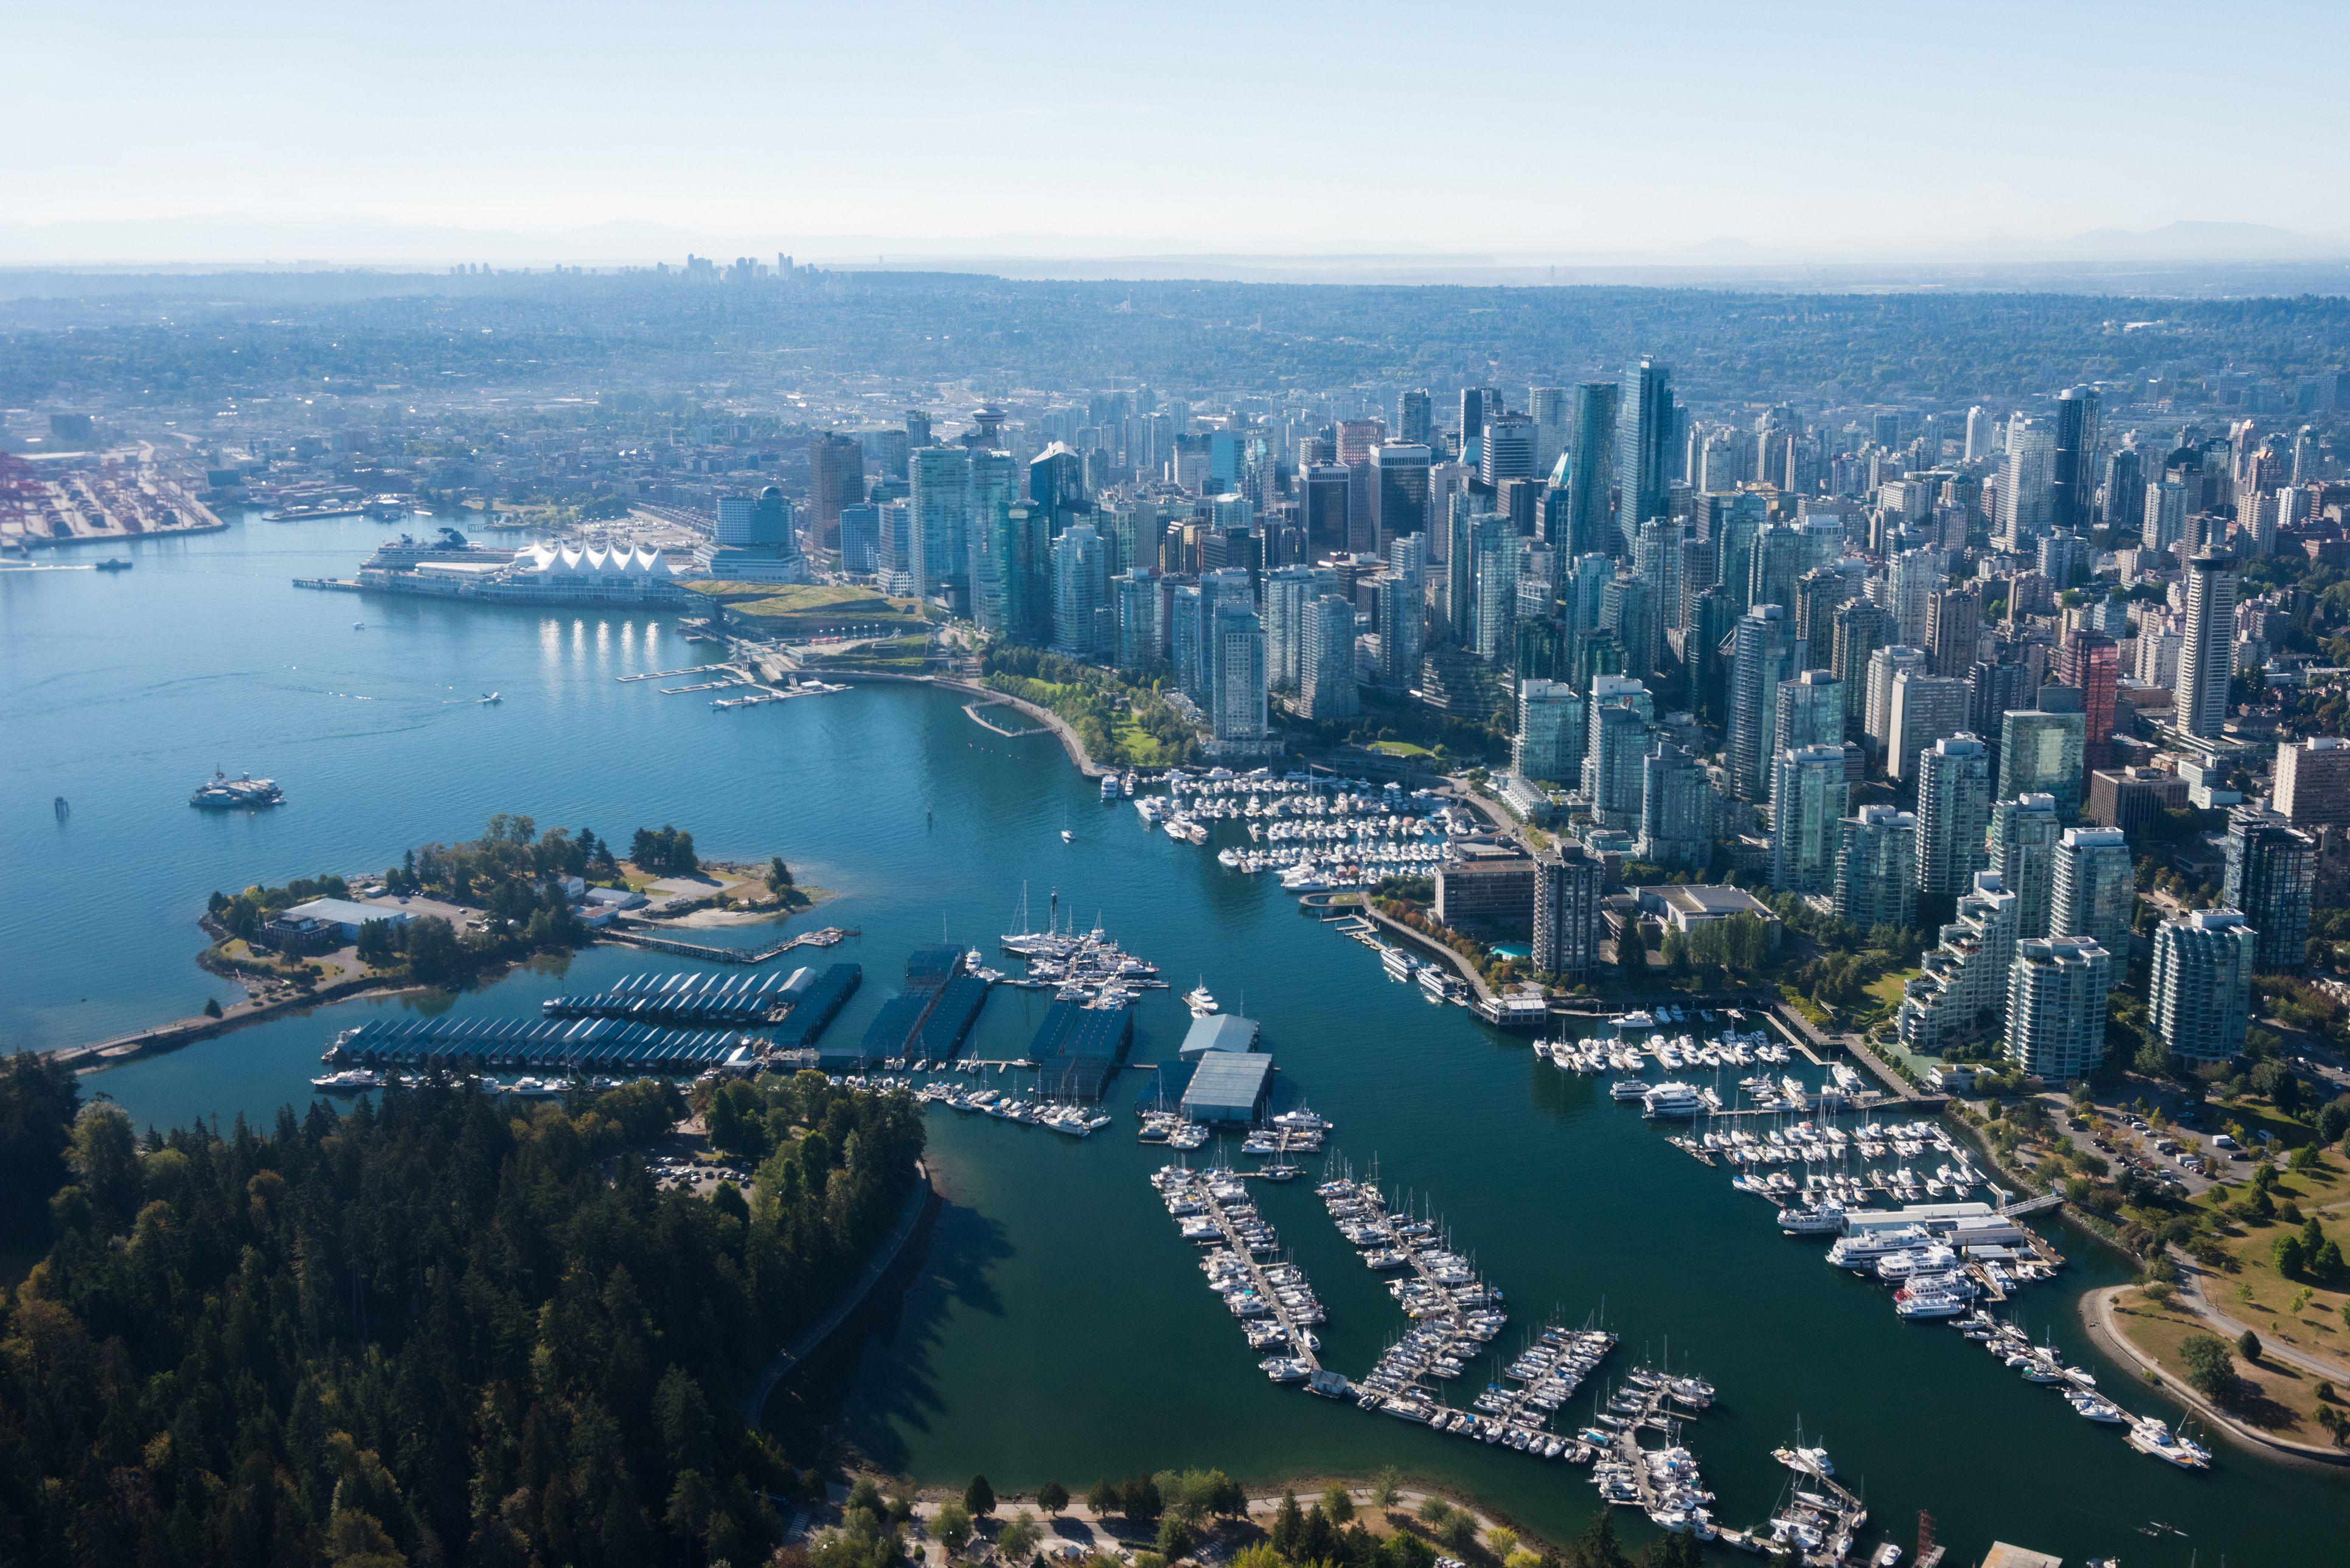 Top 10 Cities in British Columbia